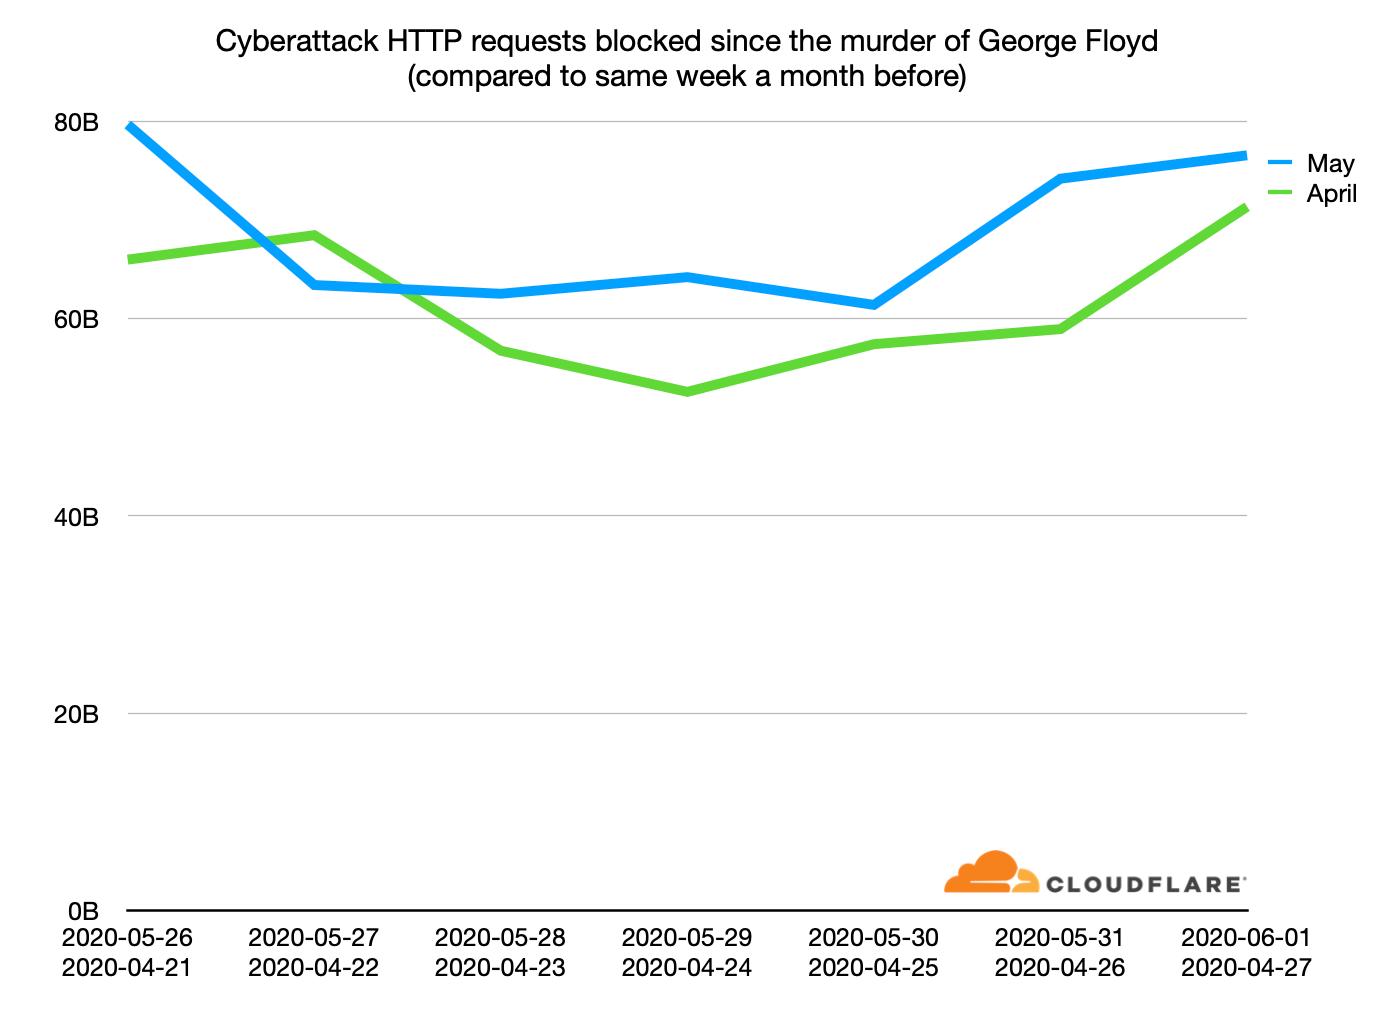 Cyberattacks since the murder of George Floyd